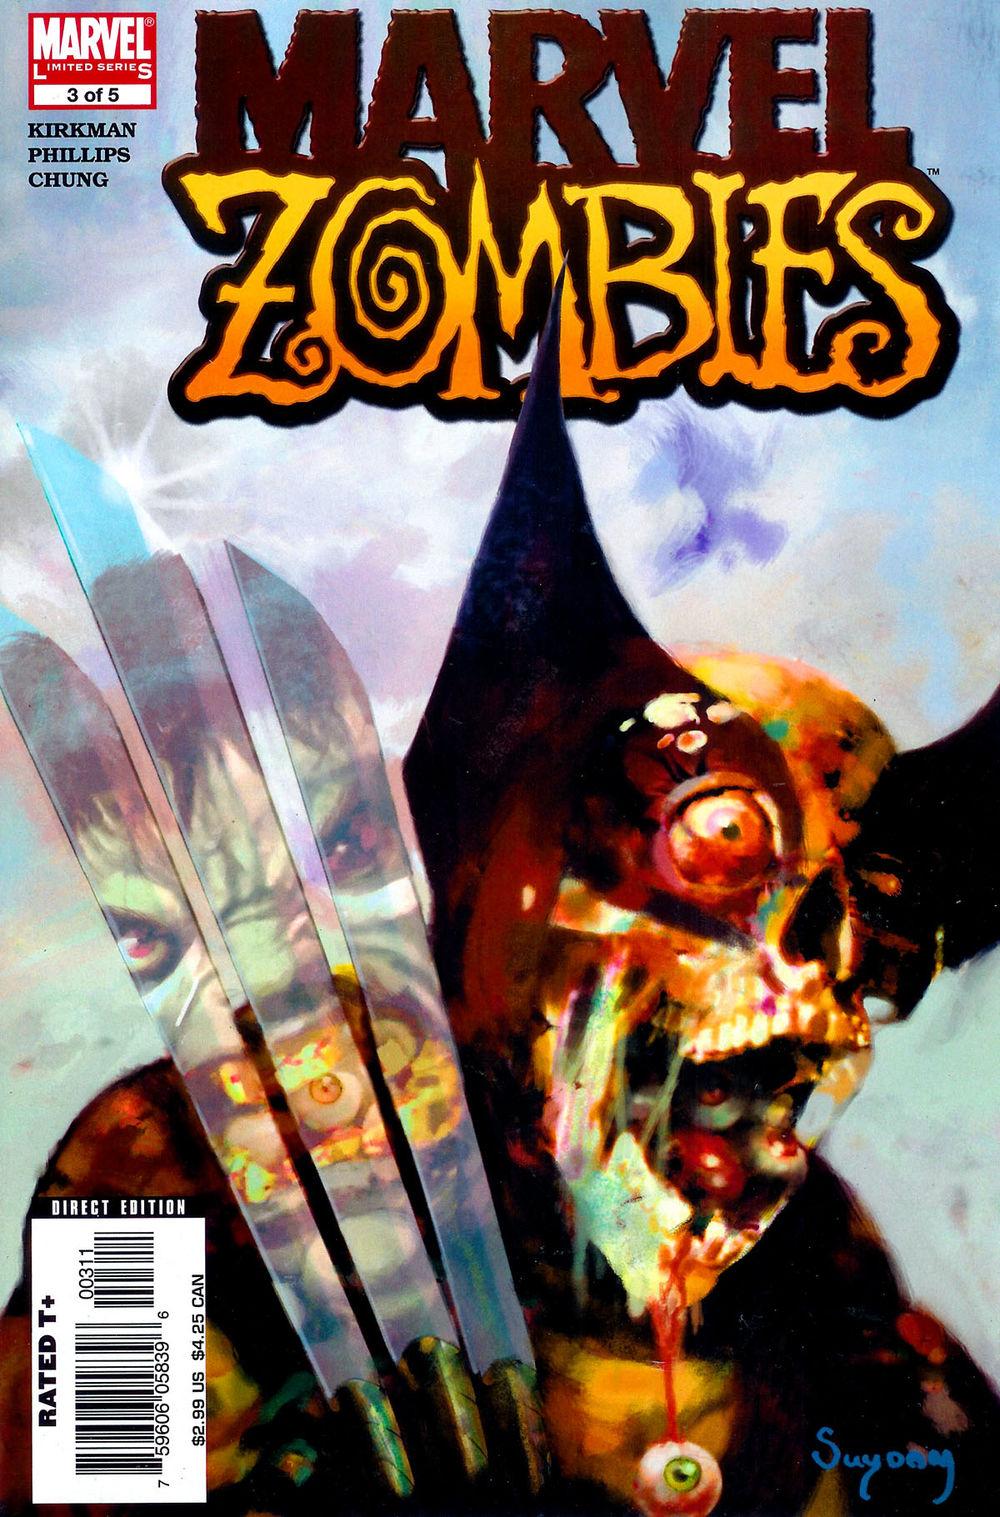 Marvel_Zombies_Vol_1_3.jpg